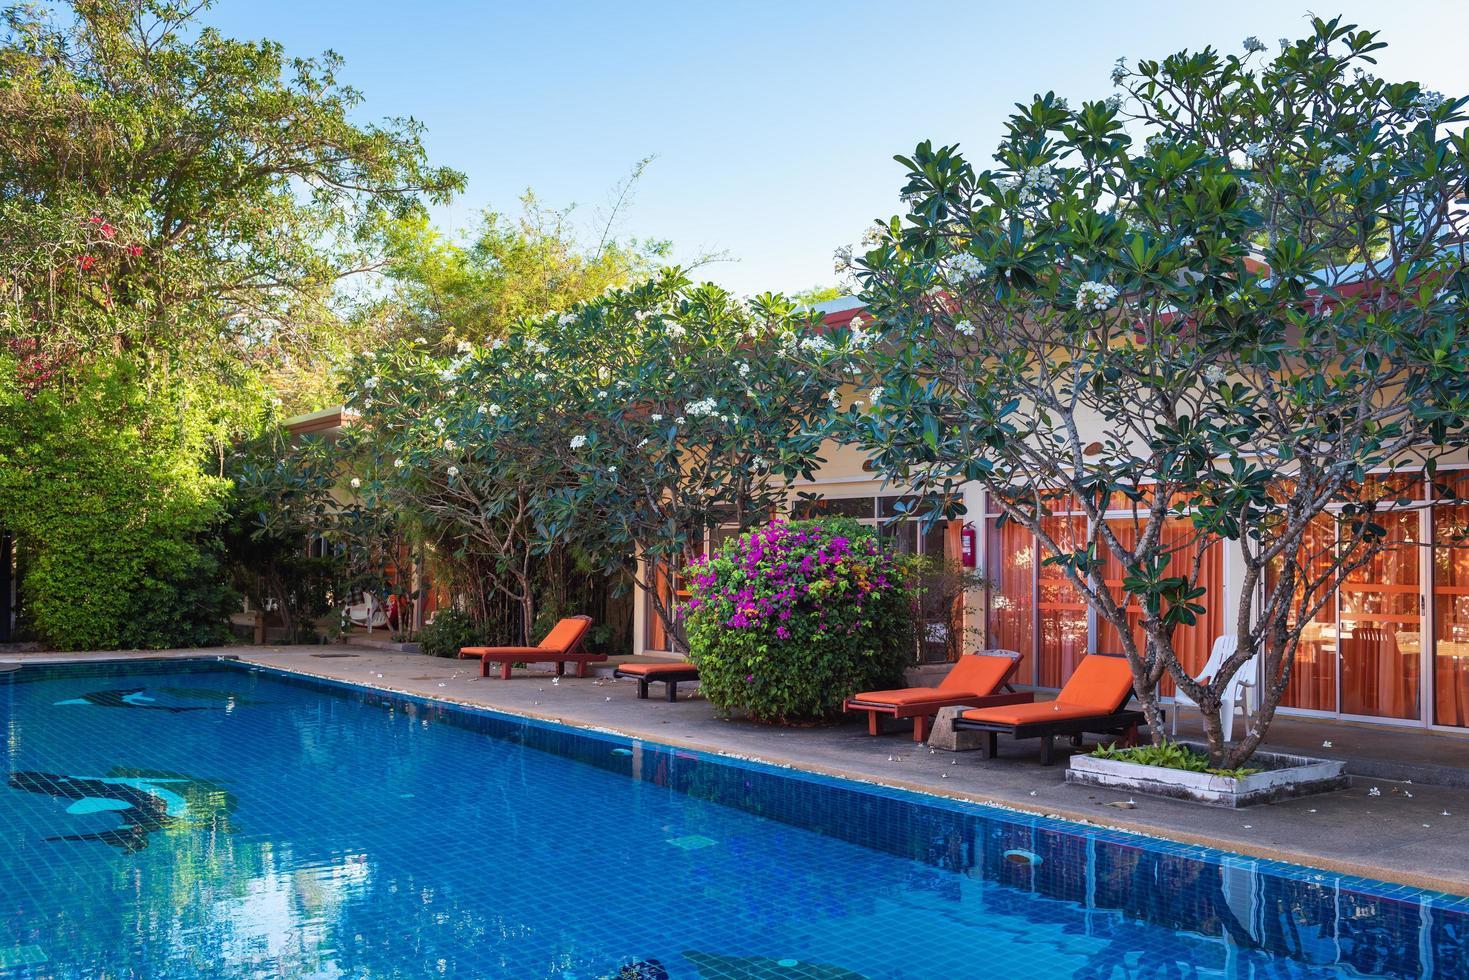 piscina e sedie in hotel foto